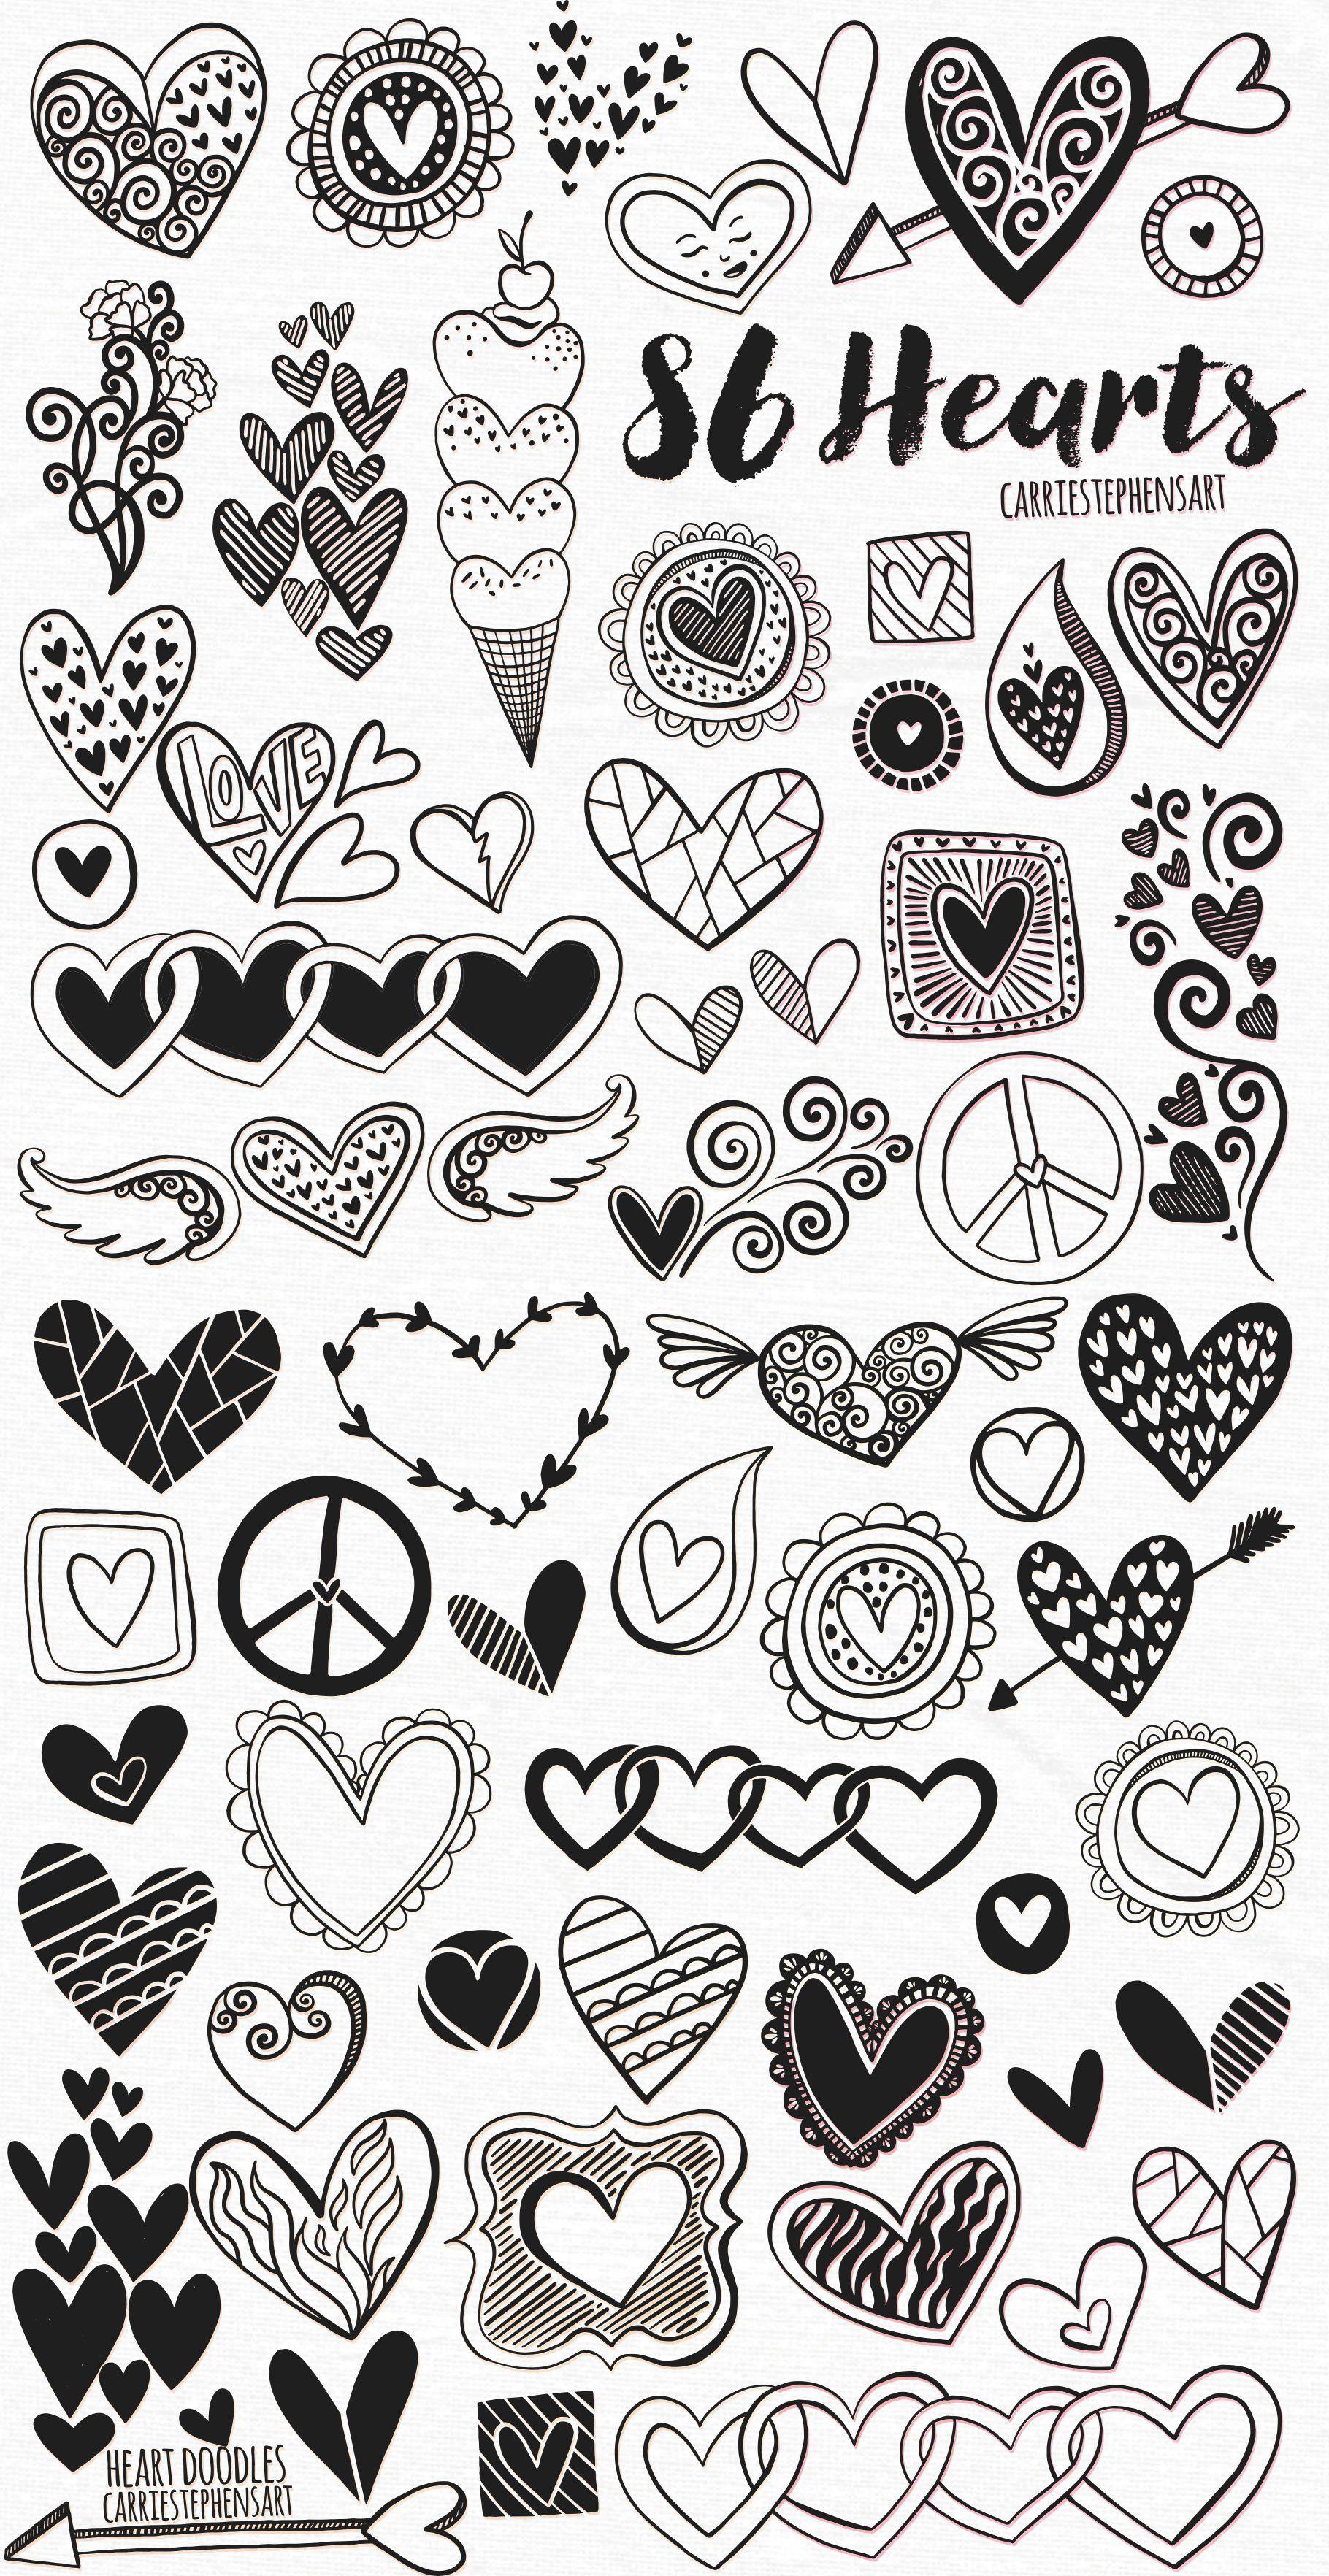 Heart Doodles.